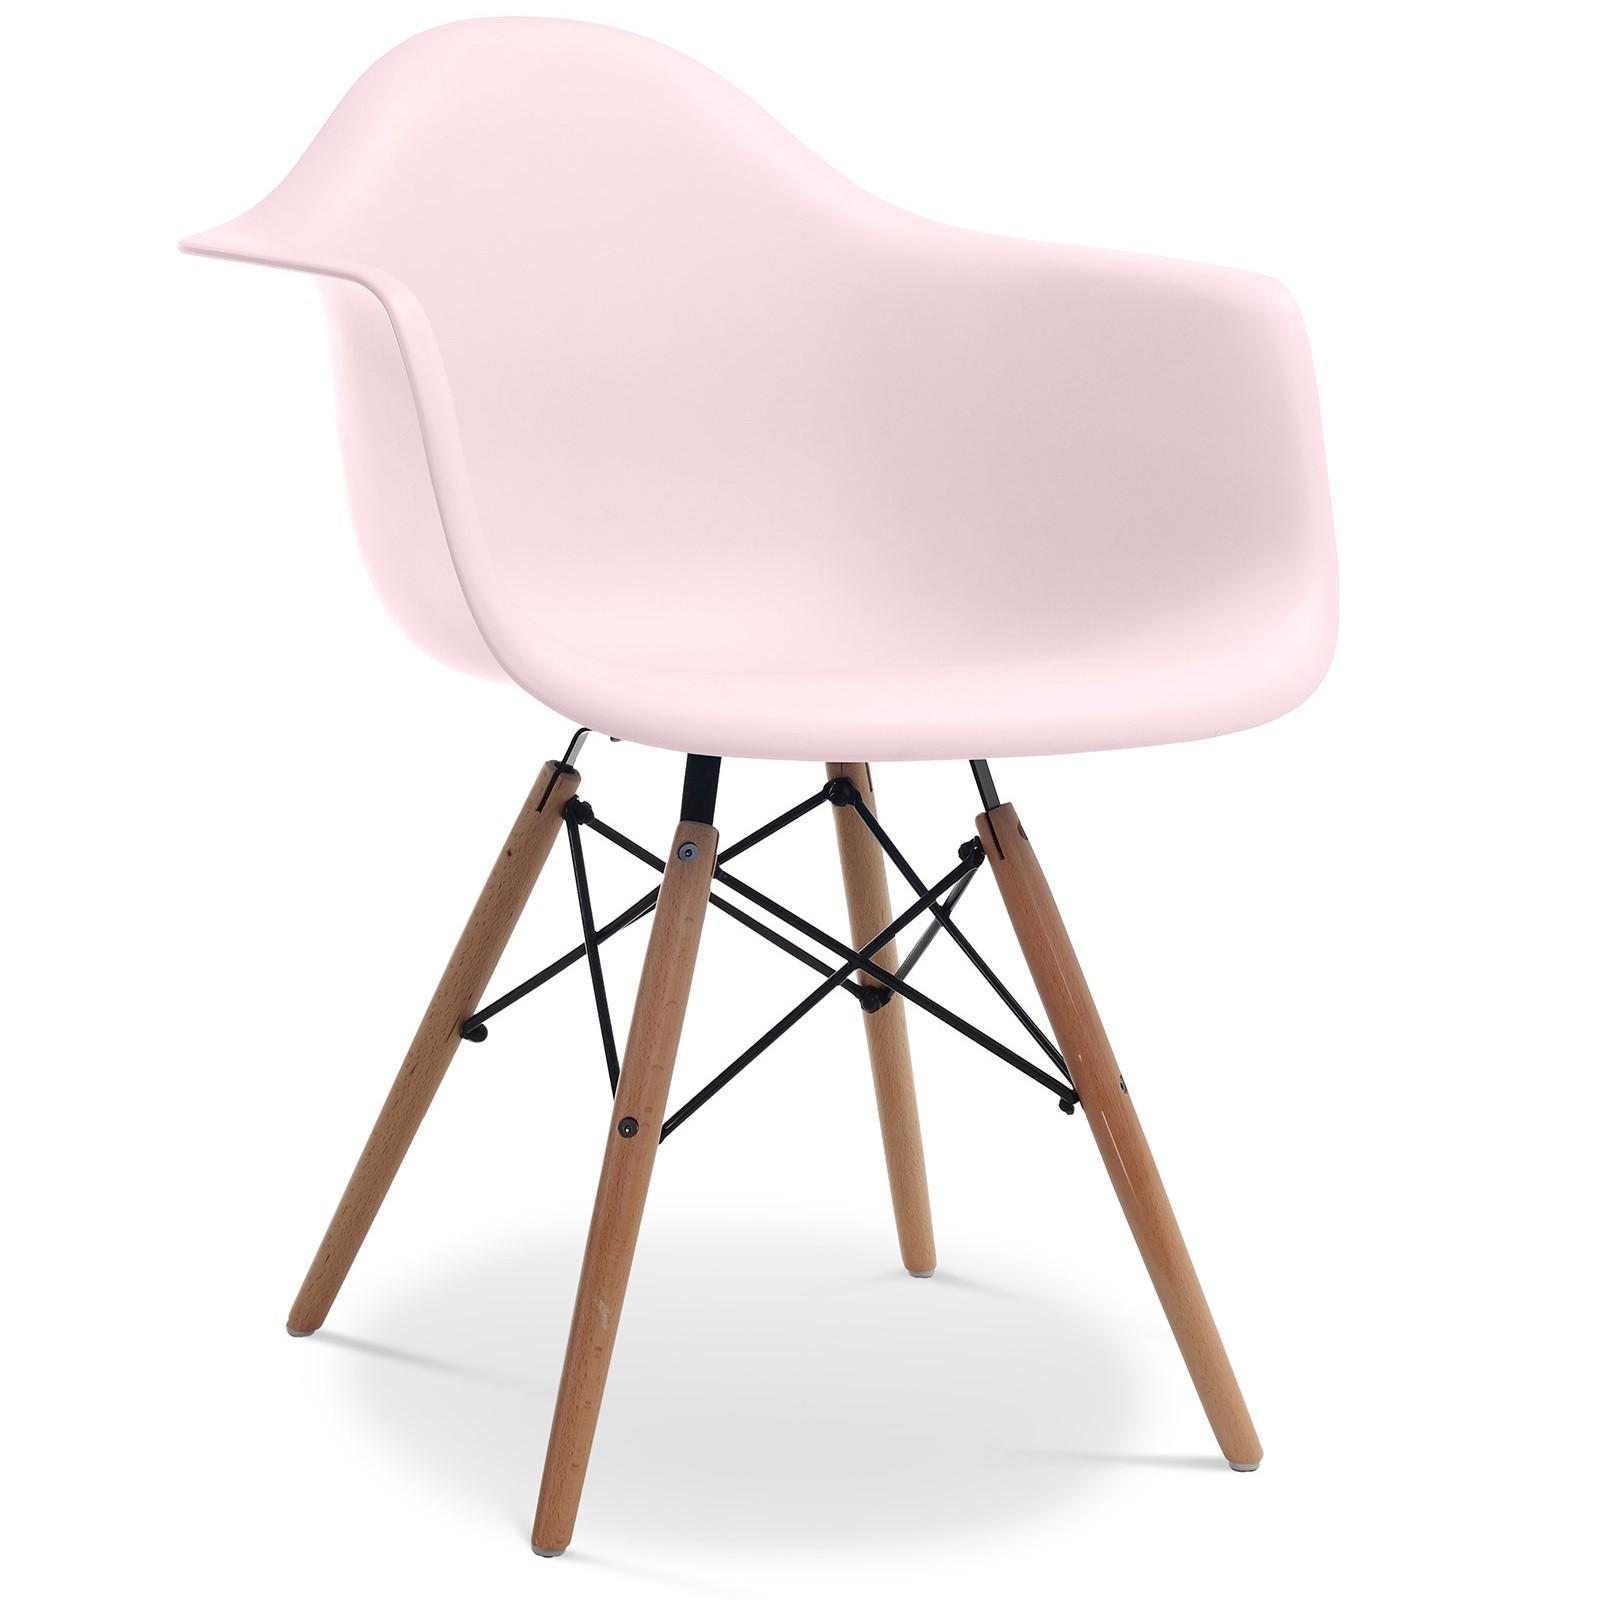 chaise polypropyl ne rose pastel mat et pieds bois clair inspir e daw lot de 2. Black Bedroom Furniture Sets. Home Design Ideas